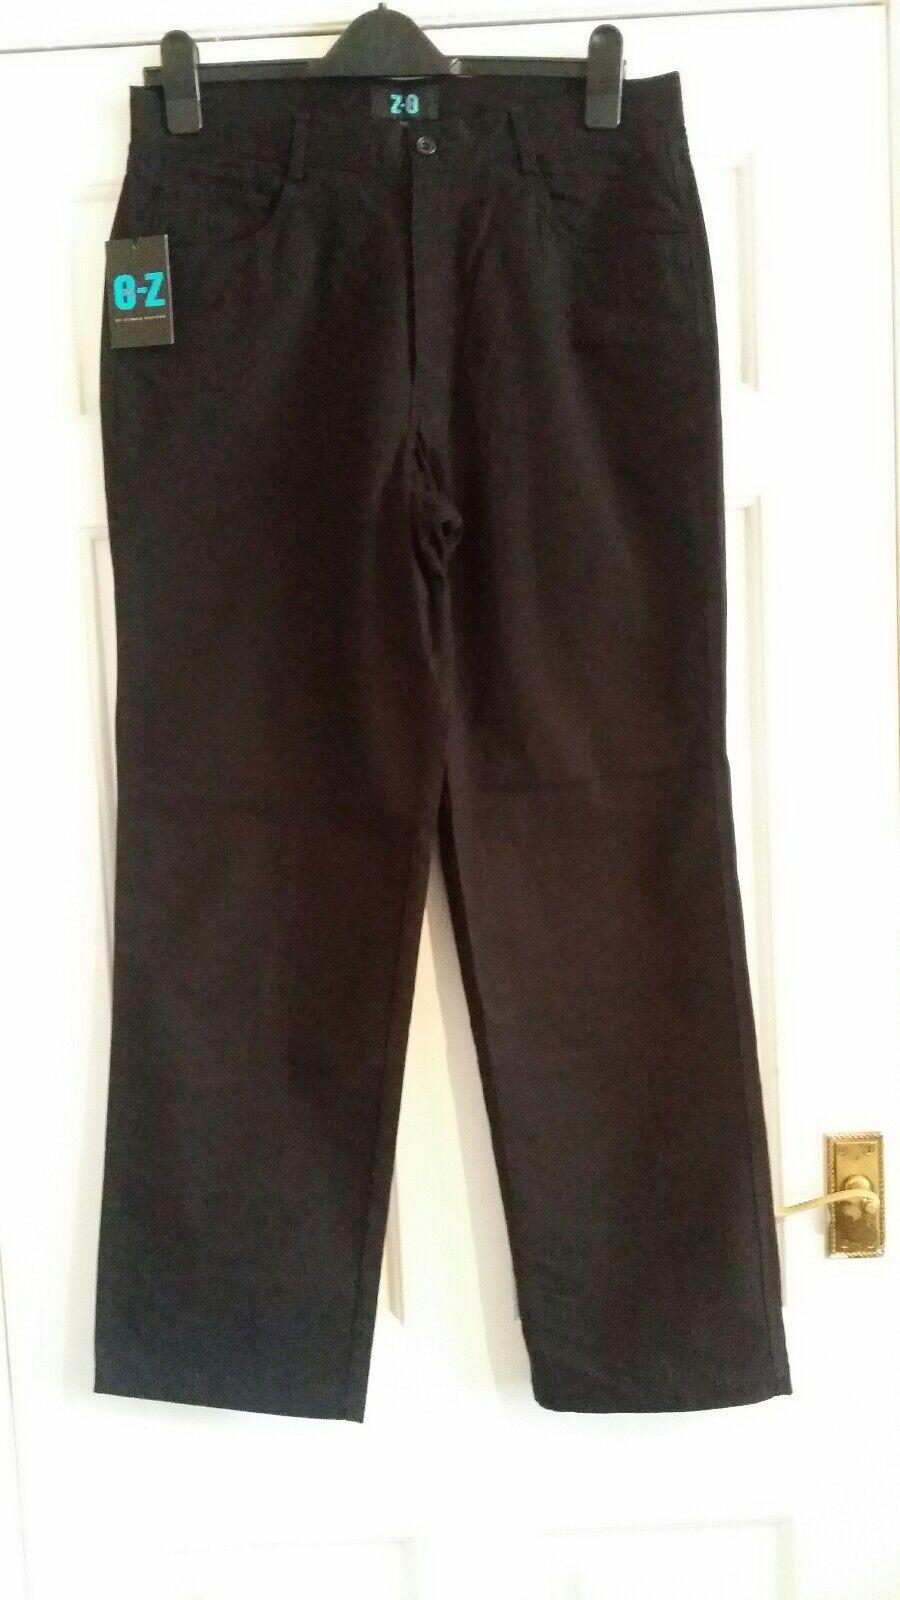 Homme O-Z O-Z O-Z Debenhams Noir Fermeture Éclair Pantalon Taille UK 34 S Bnwt 2791f3